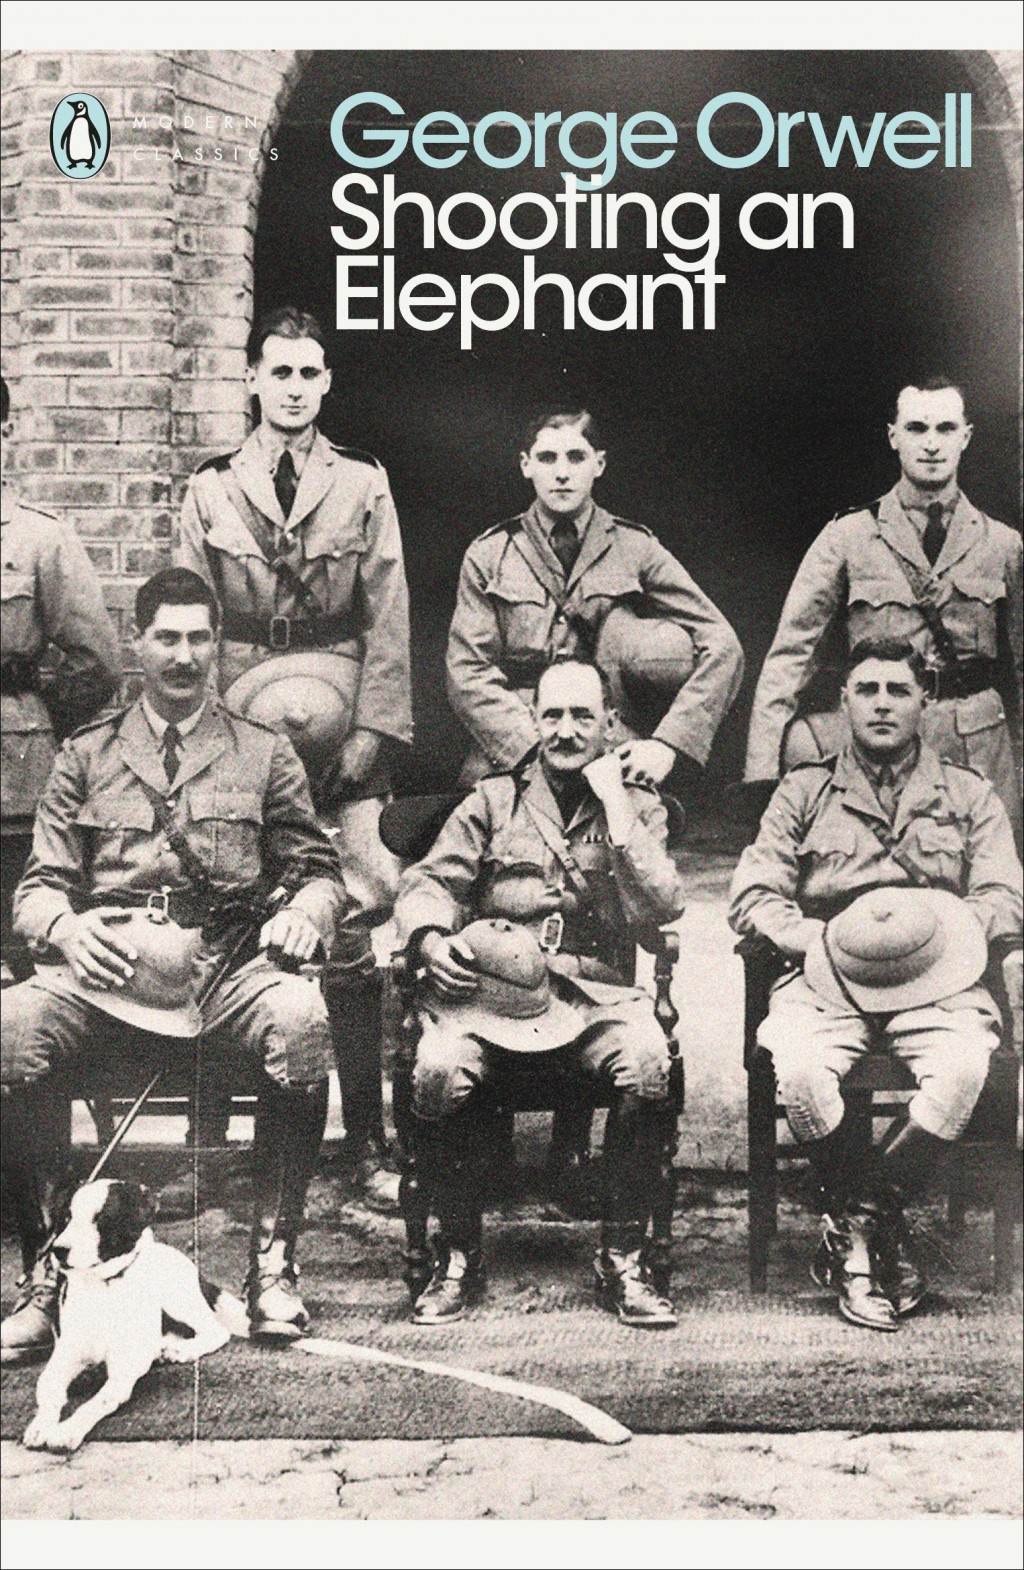 018 Essay Example George Orwell Essays Frightening Everyman's Library Summary Bookshop Memories Large